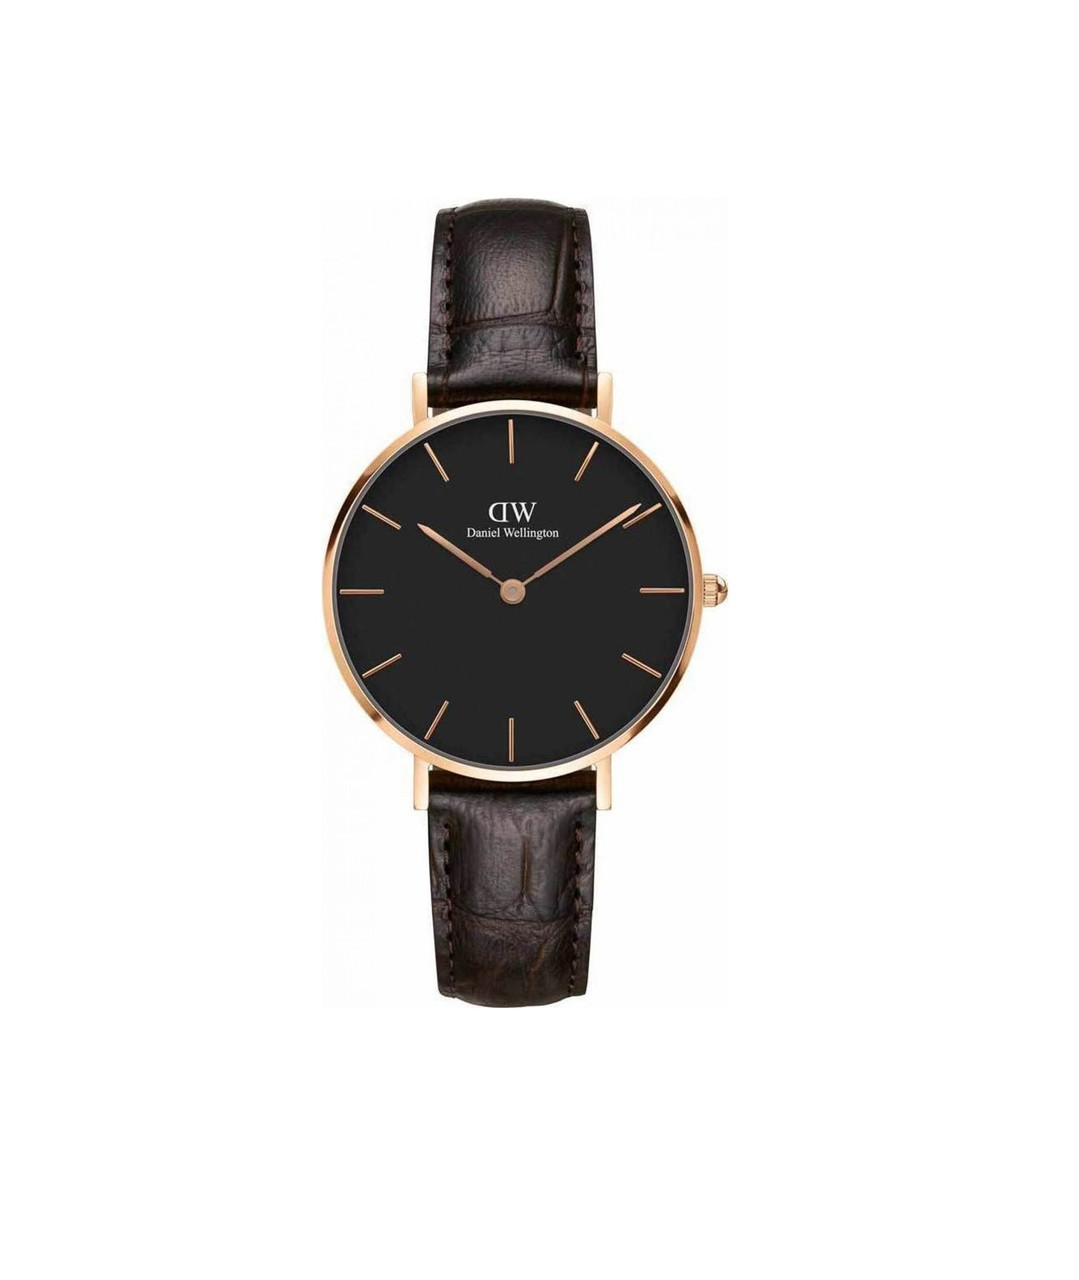 Часы Daniel Wellington DW00100170